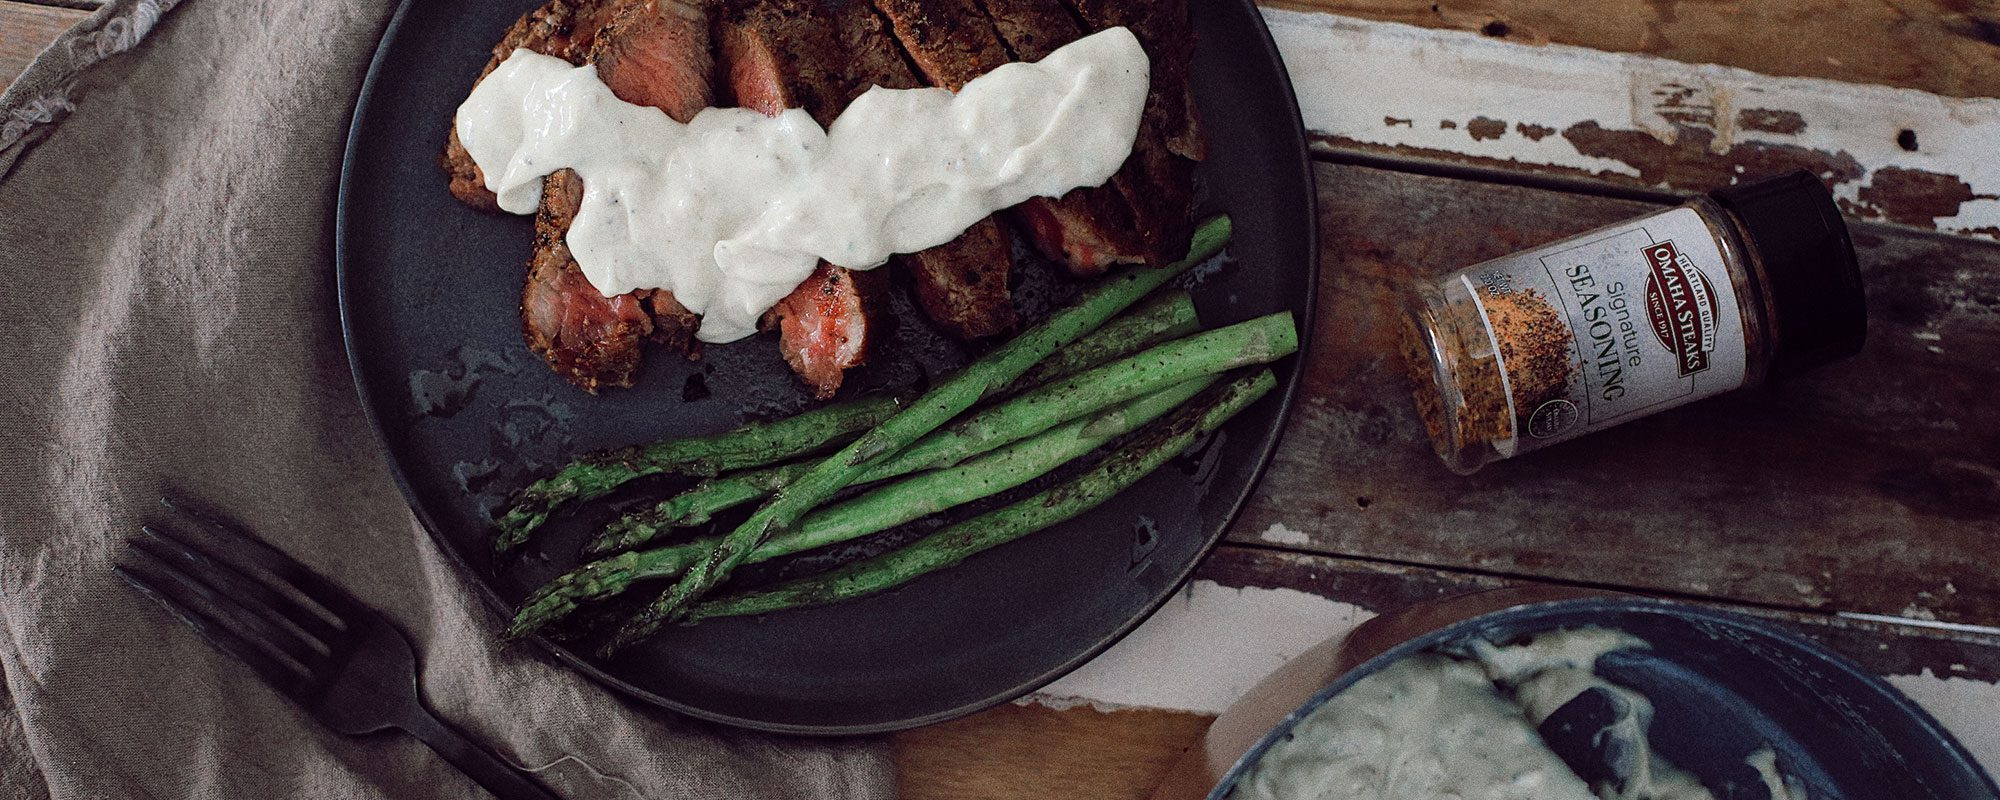 Pan-Seared Ribeye Steak with Gorgonzola Cream Sauce